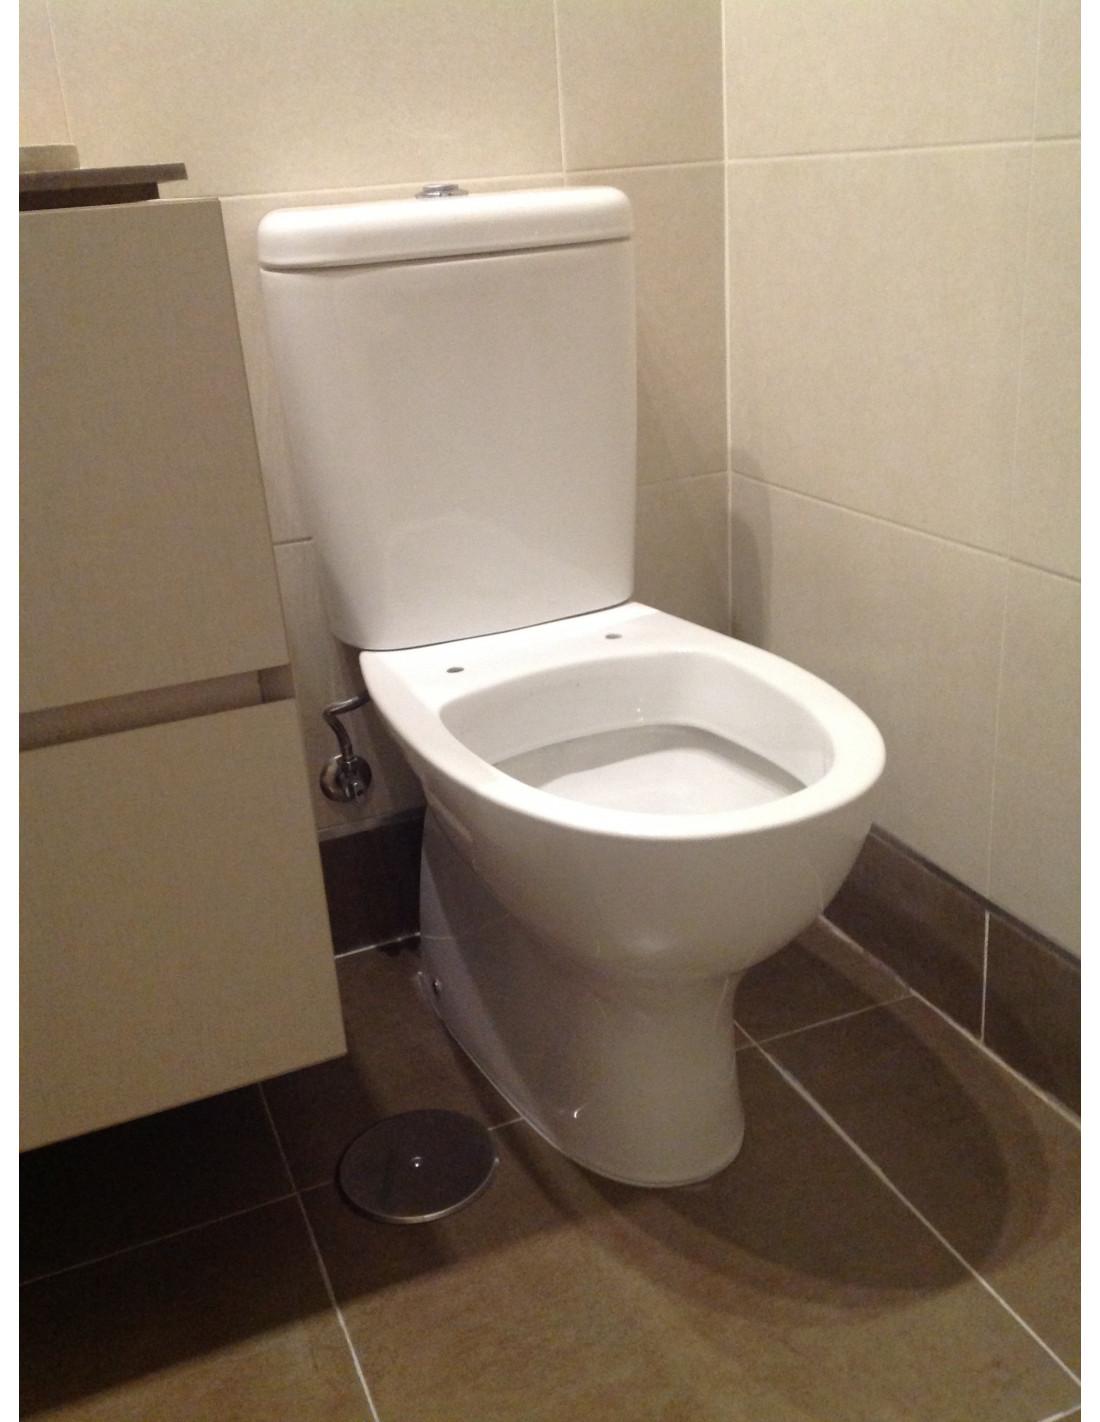 seat wc gala loa adaptable resiwood. Black Bedroom Furniture Sets. Home Design Ideas